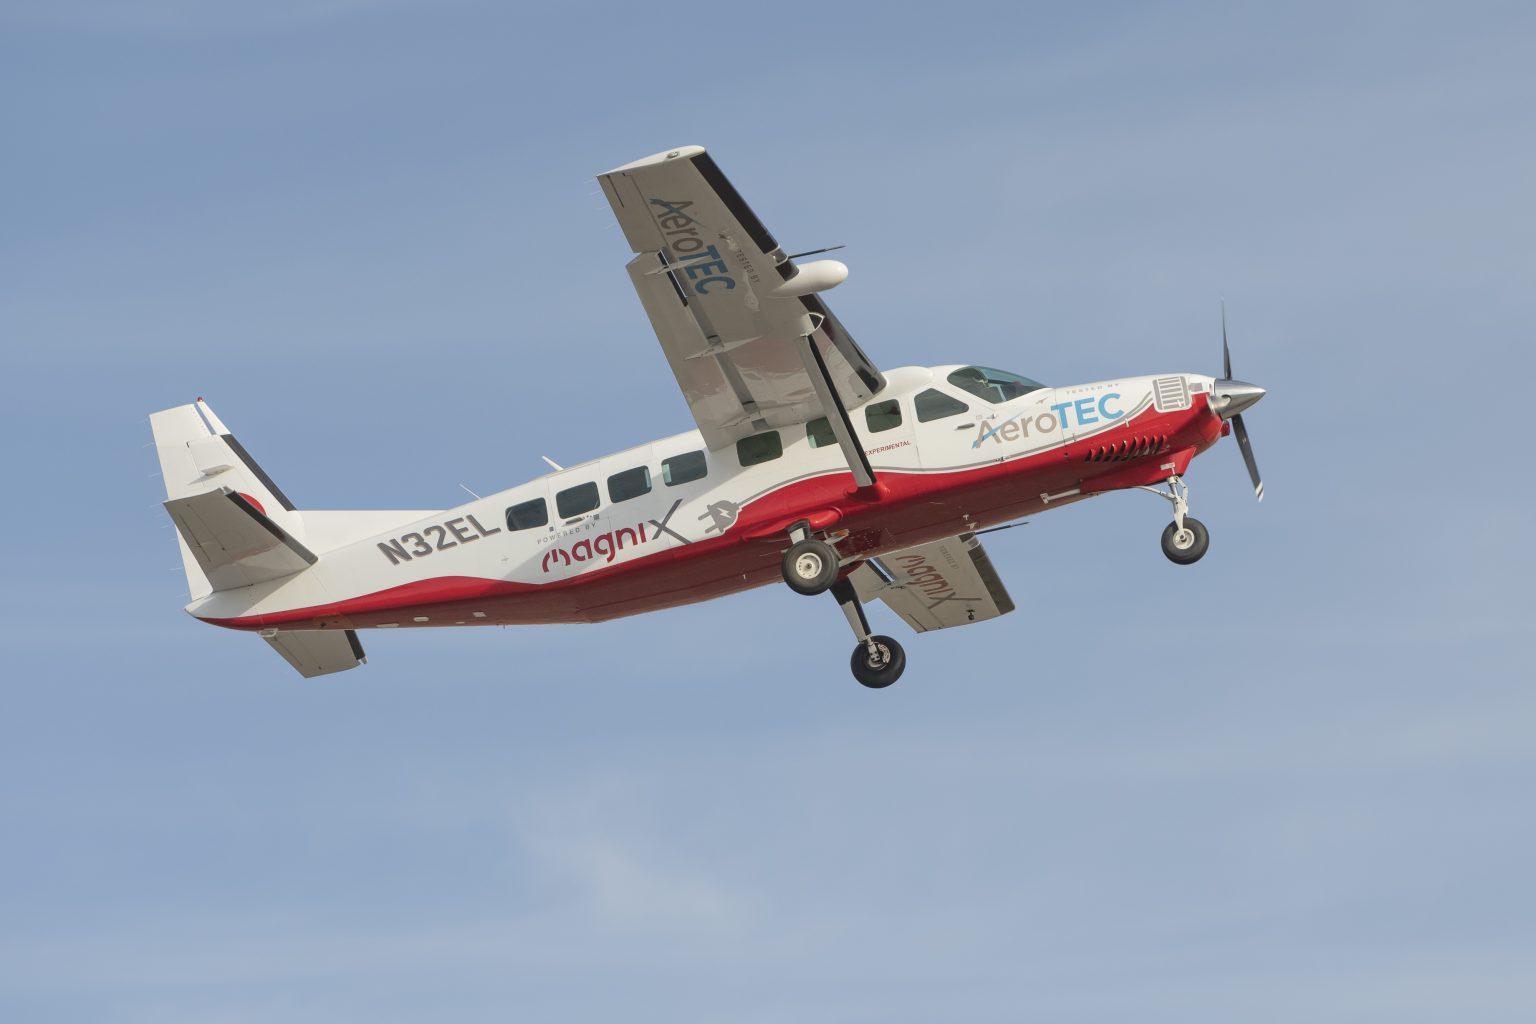 Electric Caravan Makes First Flight